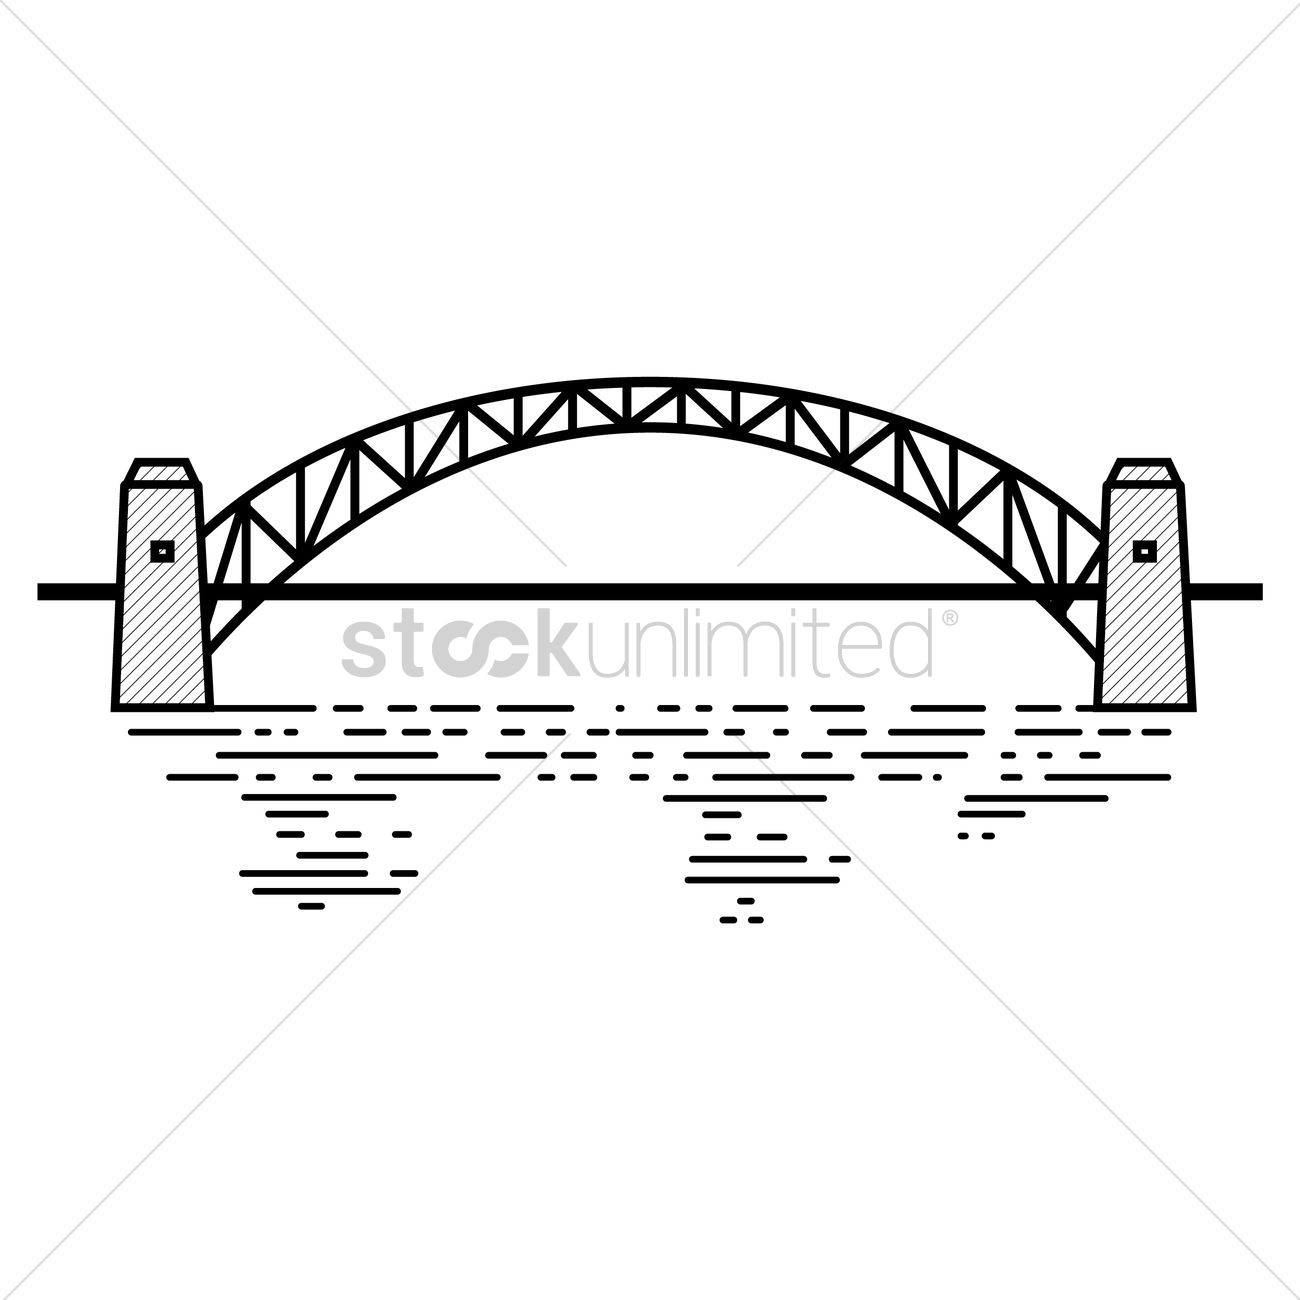 Sydney Harbour Bridge Vector Image